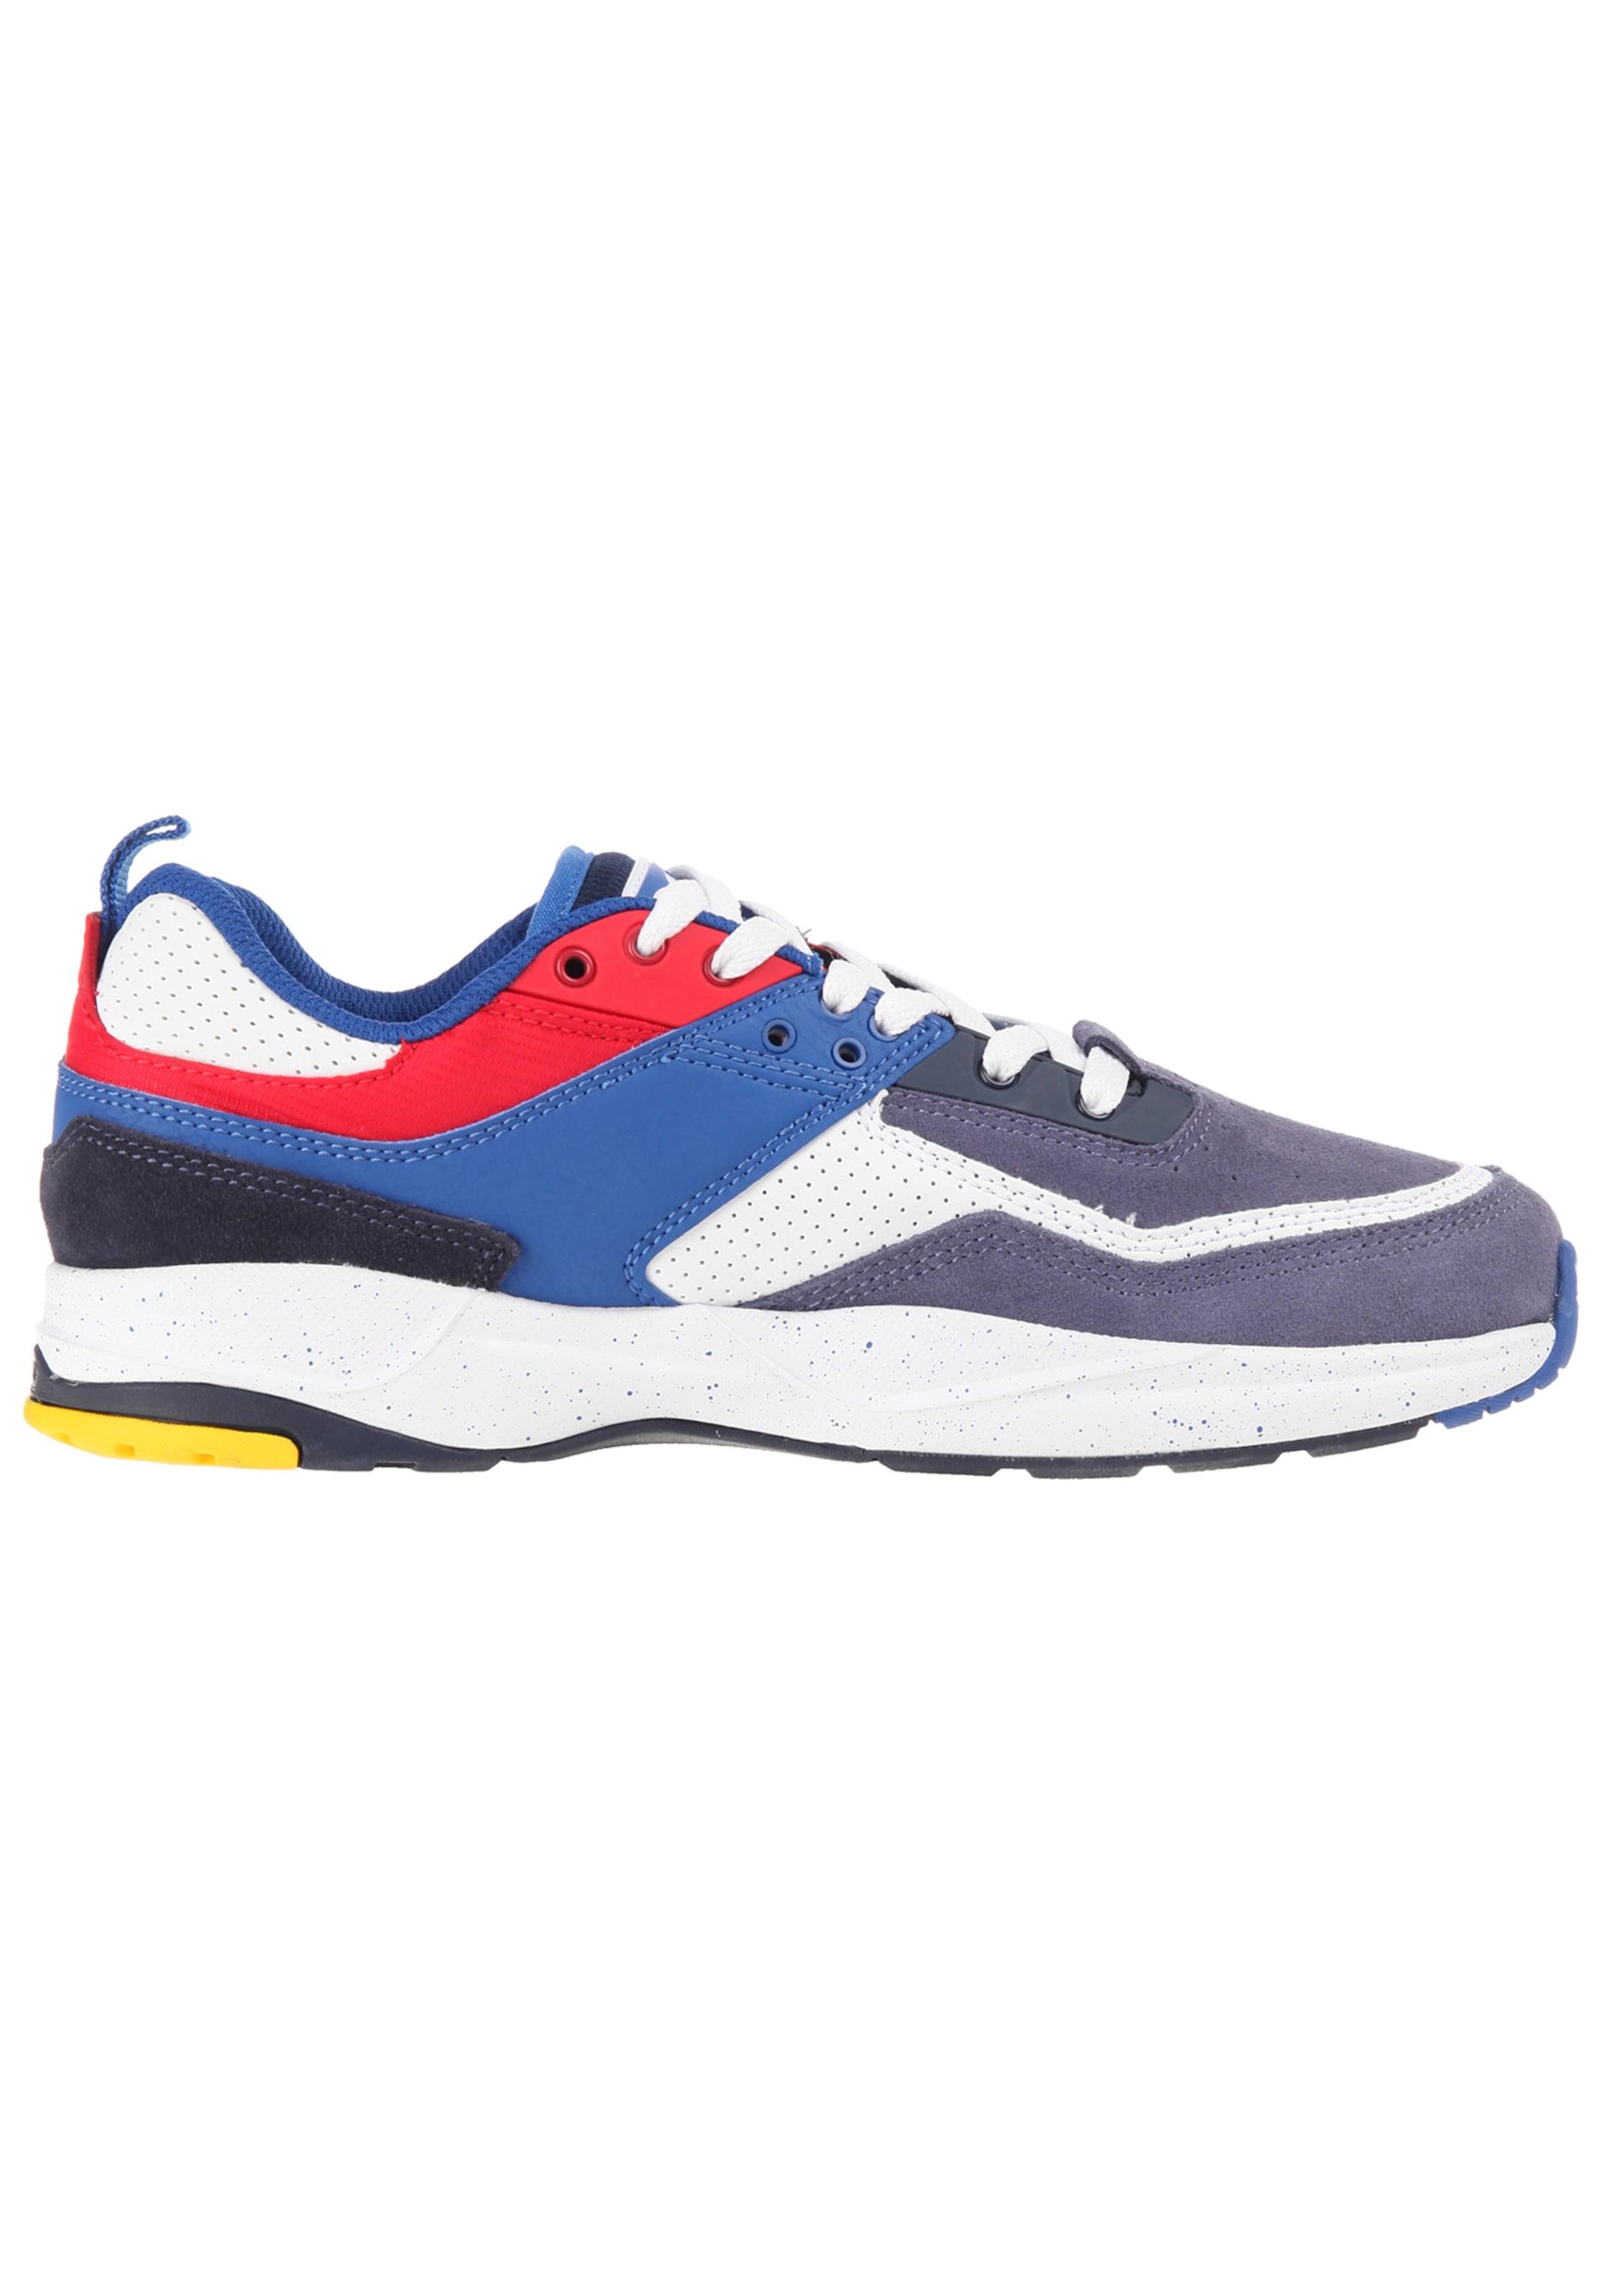 In Sneaker Schwarz BlauViolettblau Weiß Dc Hellrot 'e Shoes tribeka' sQtxhdrC